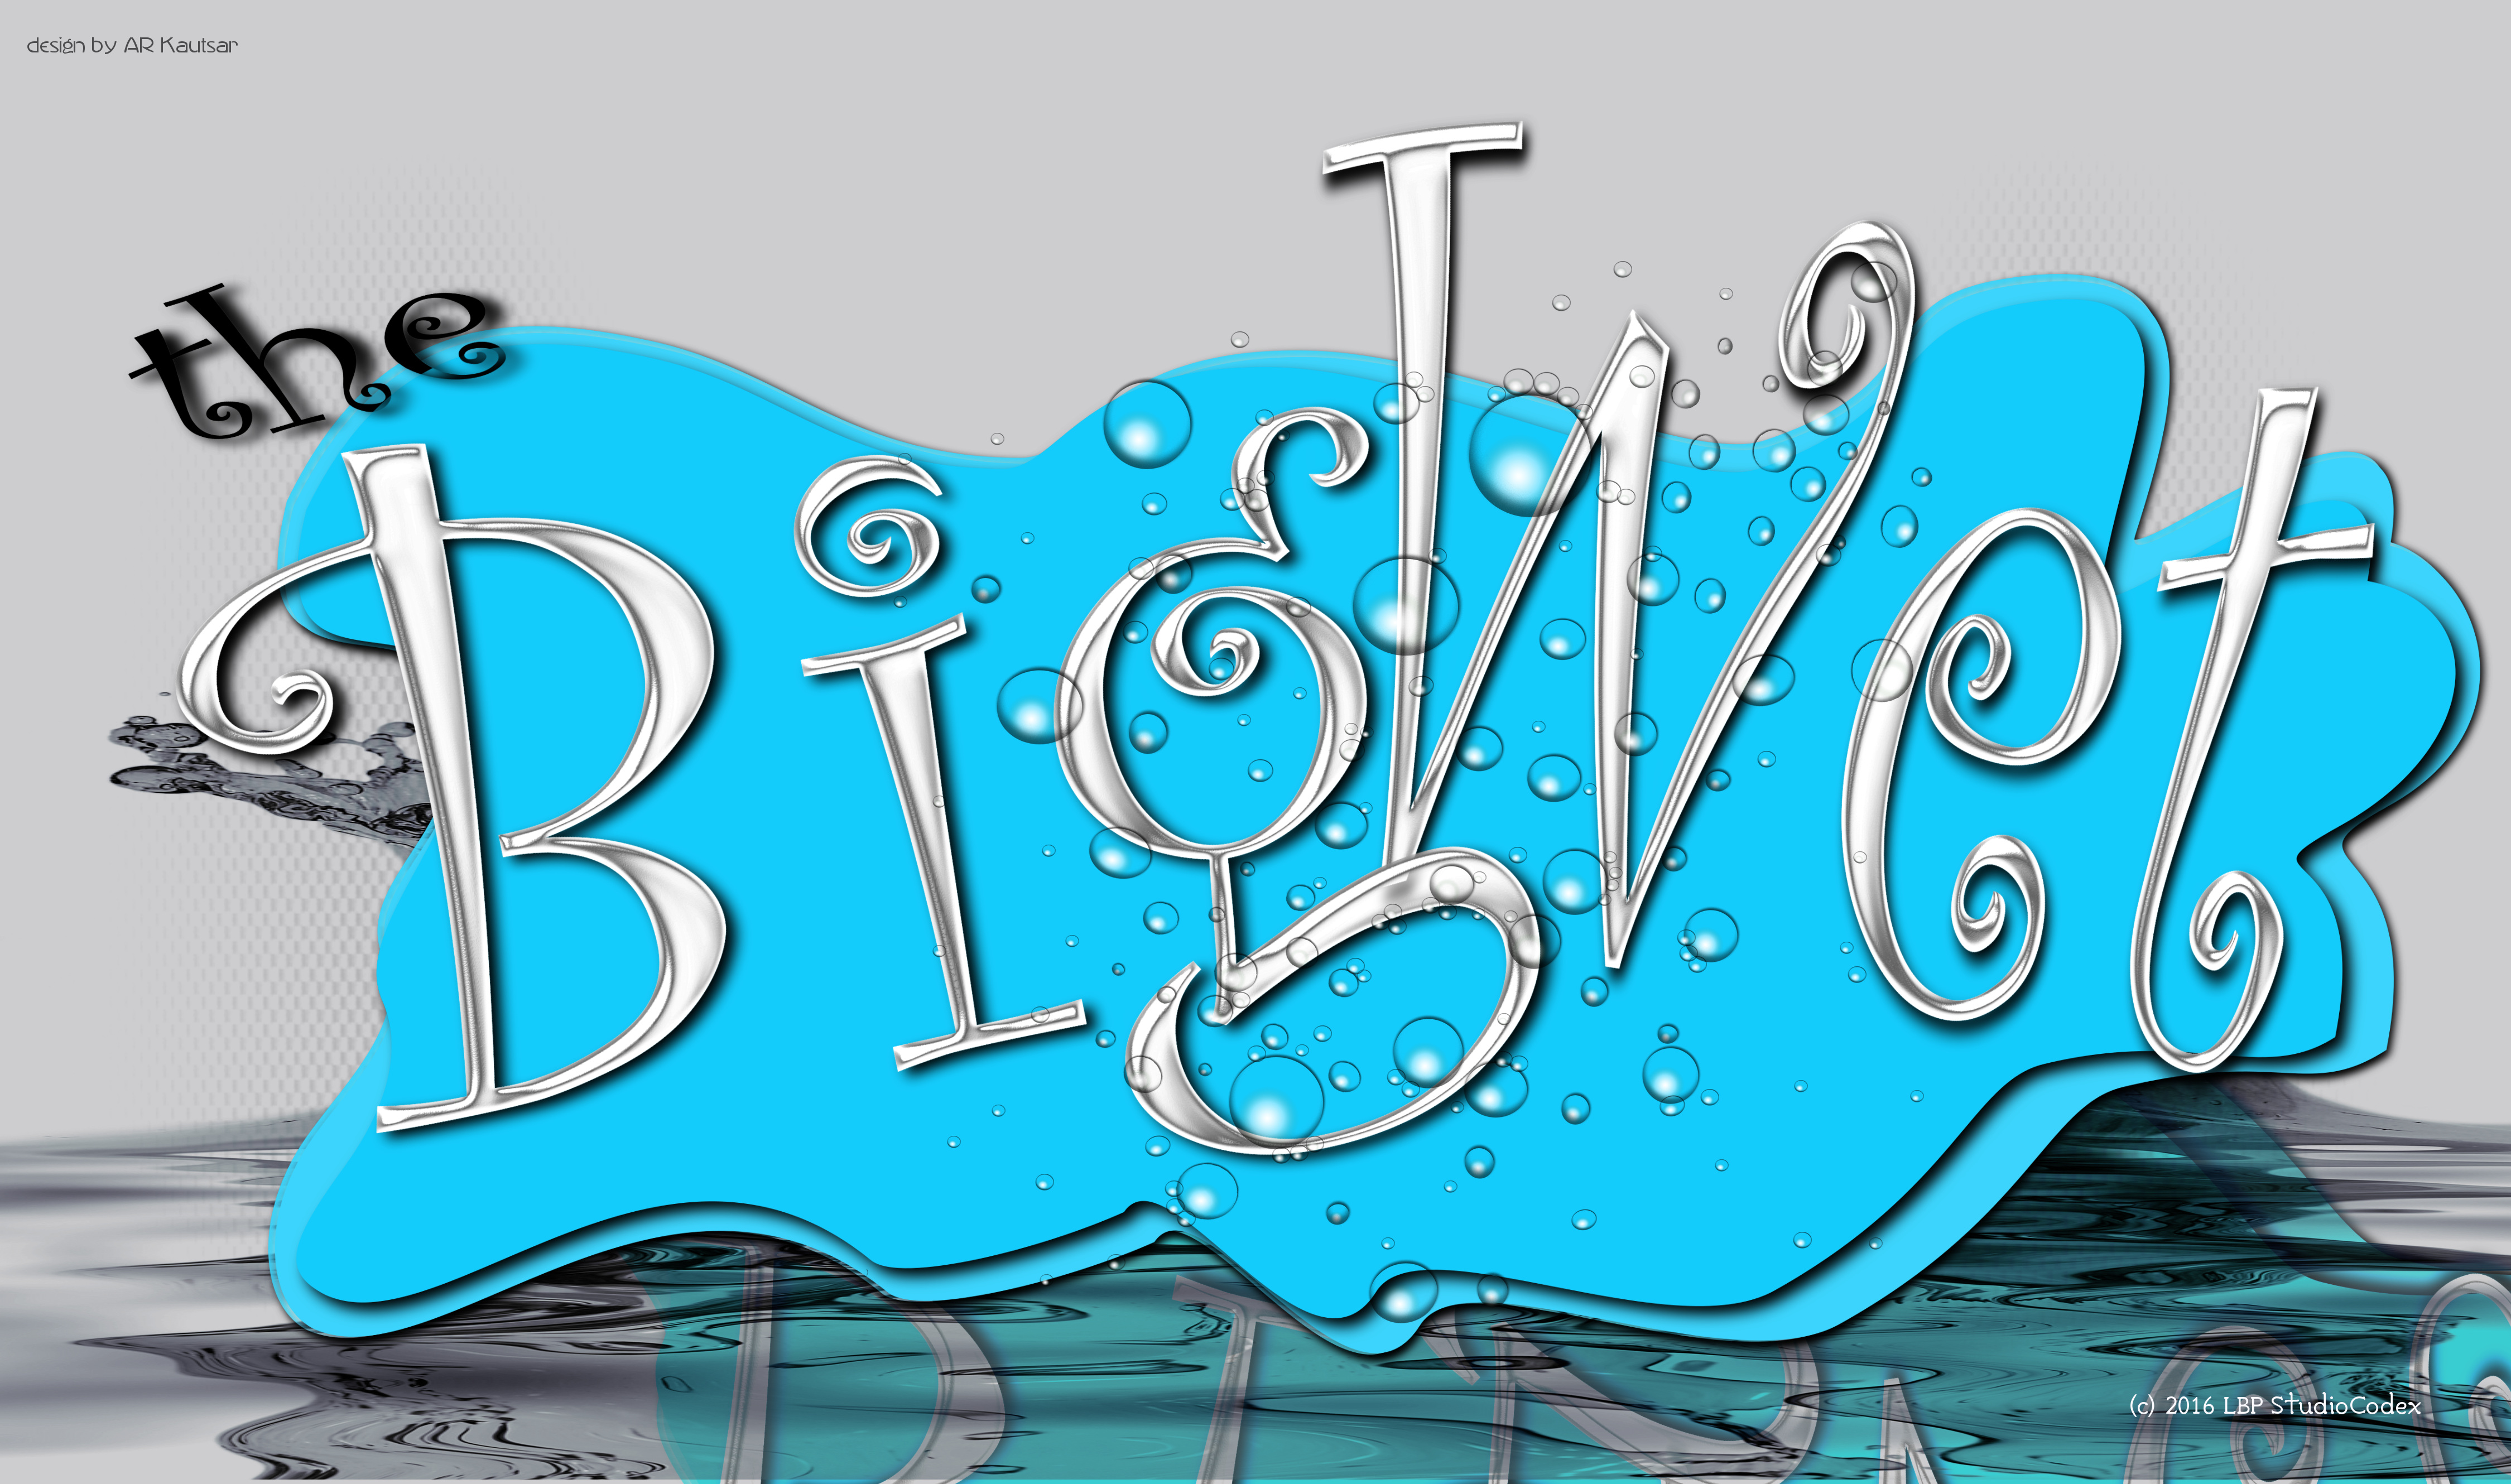 The bigwet 2.0 cb3f7fef6c